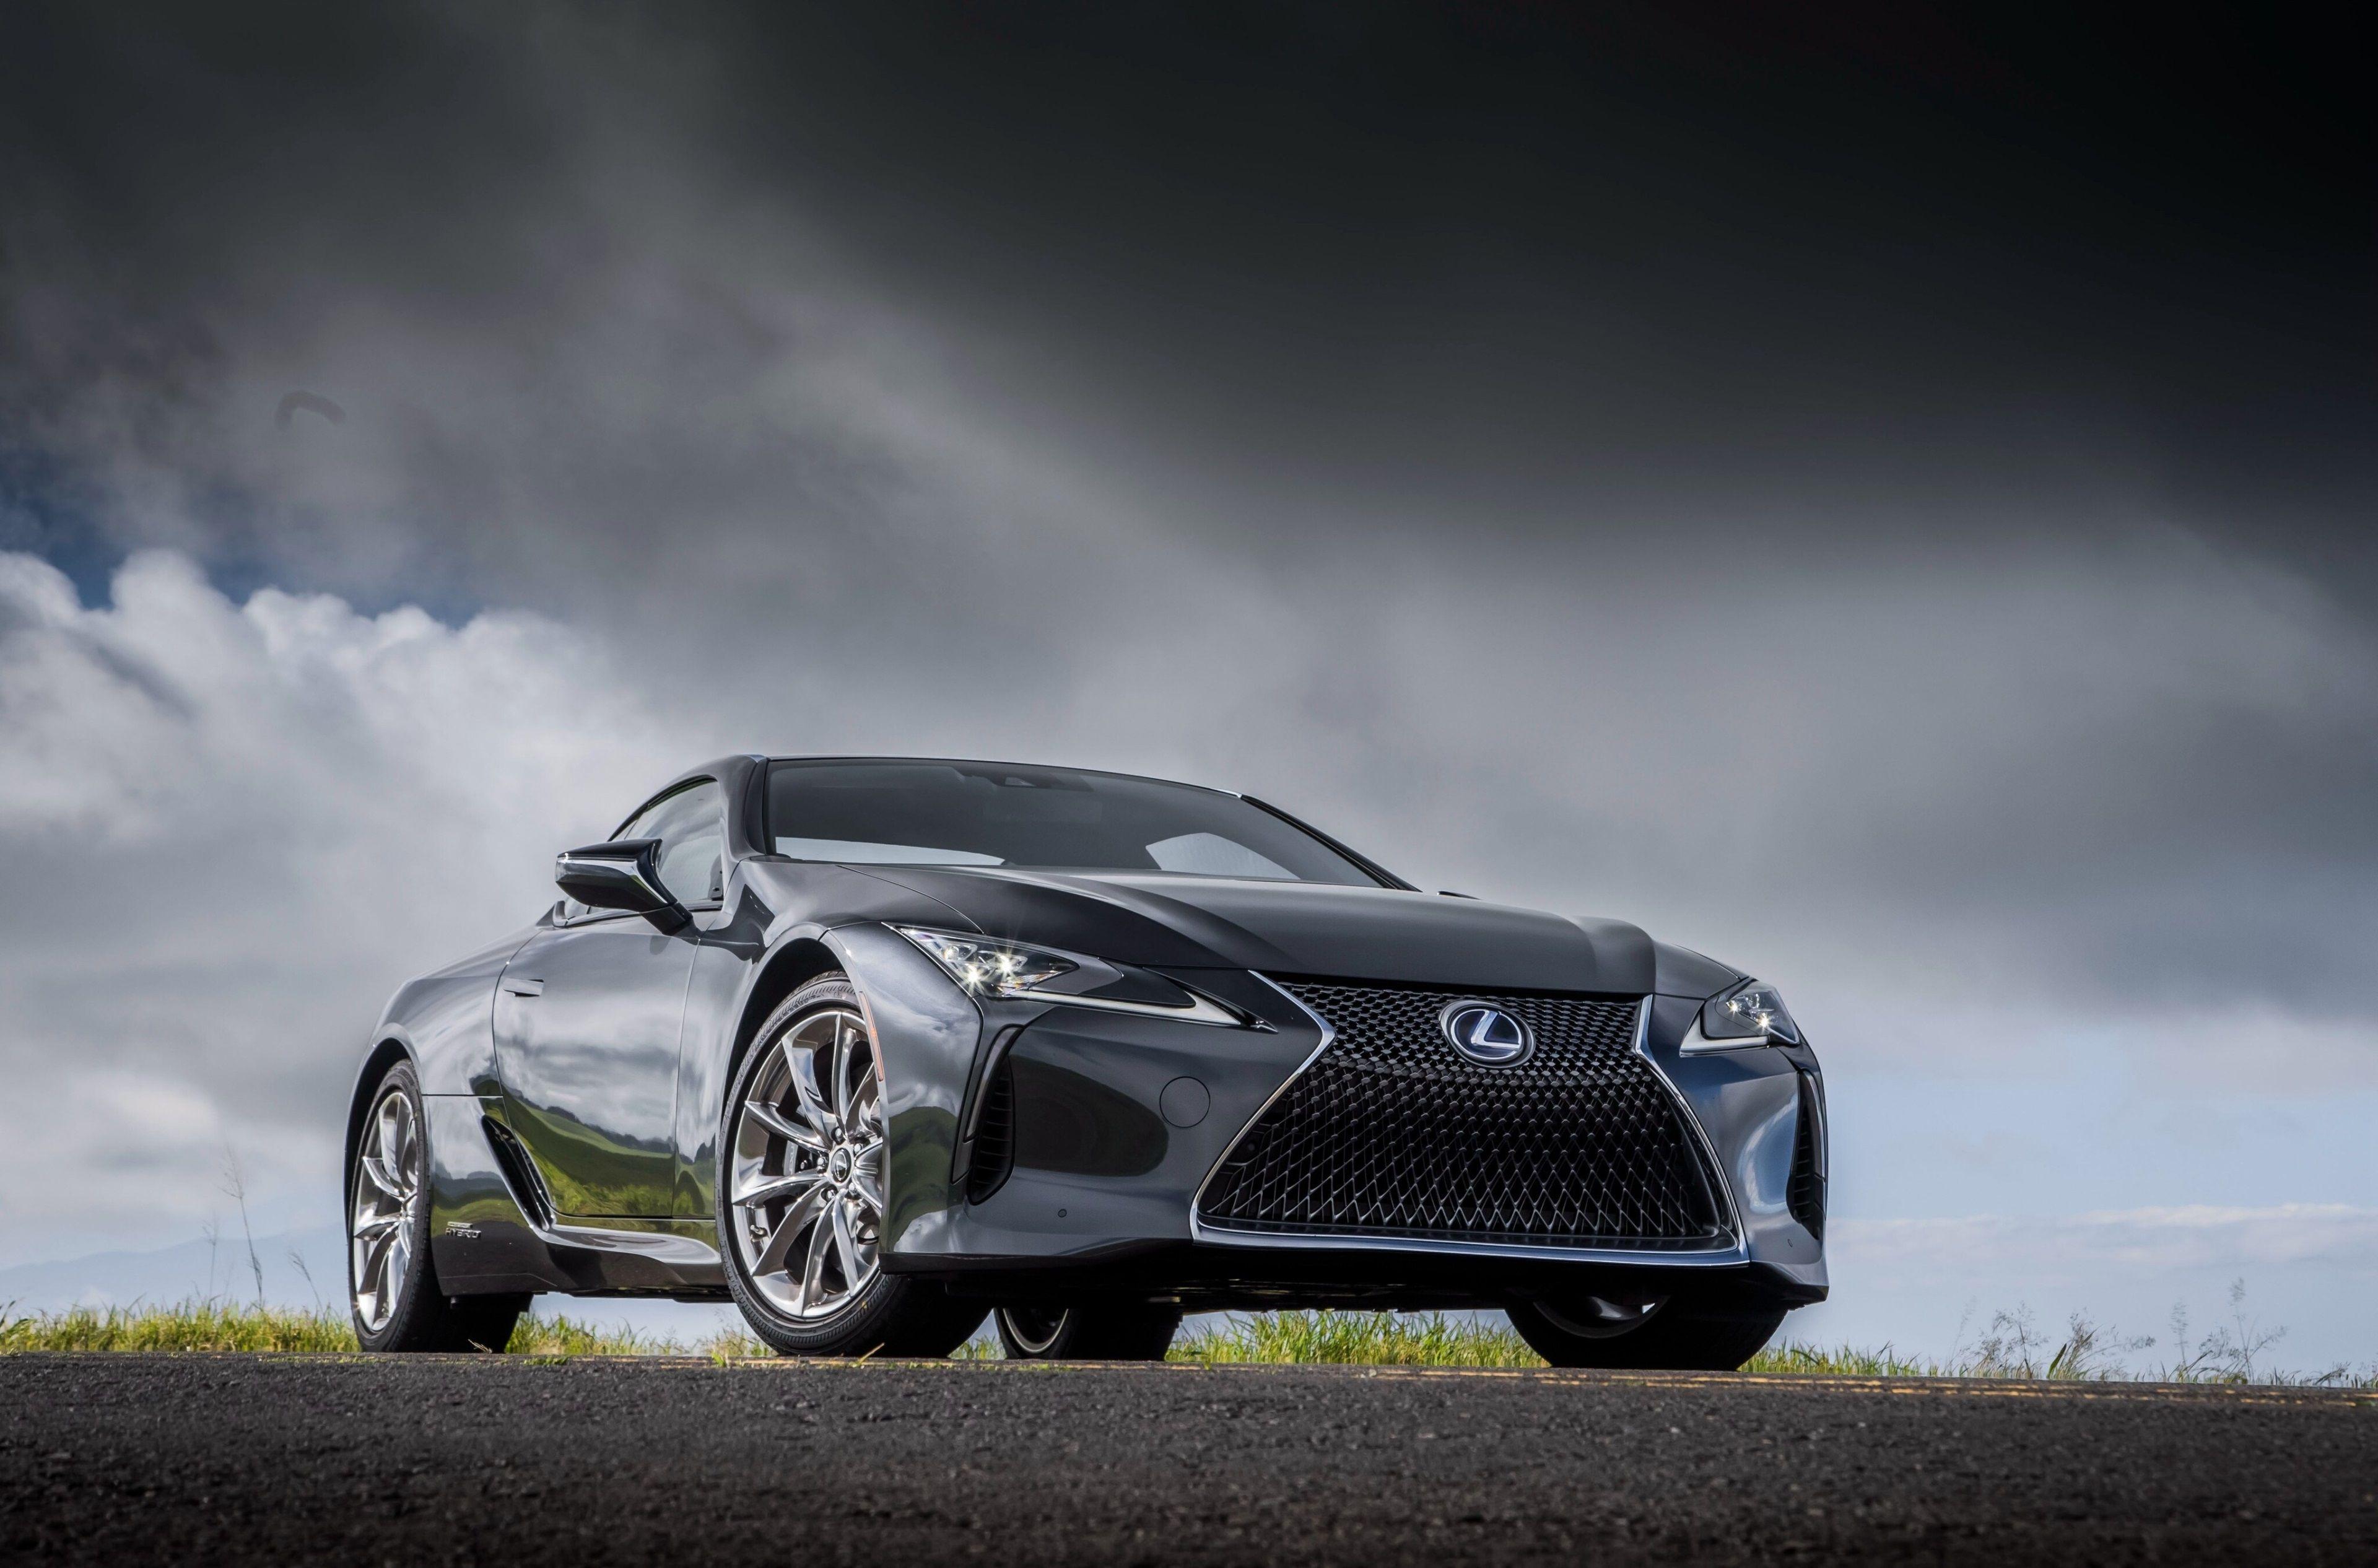 3840x2532 Lexus Lc 500h 4k Wallpaper Super Cars And